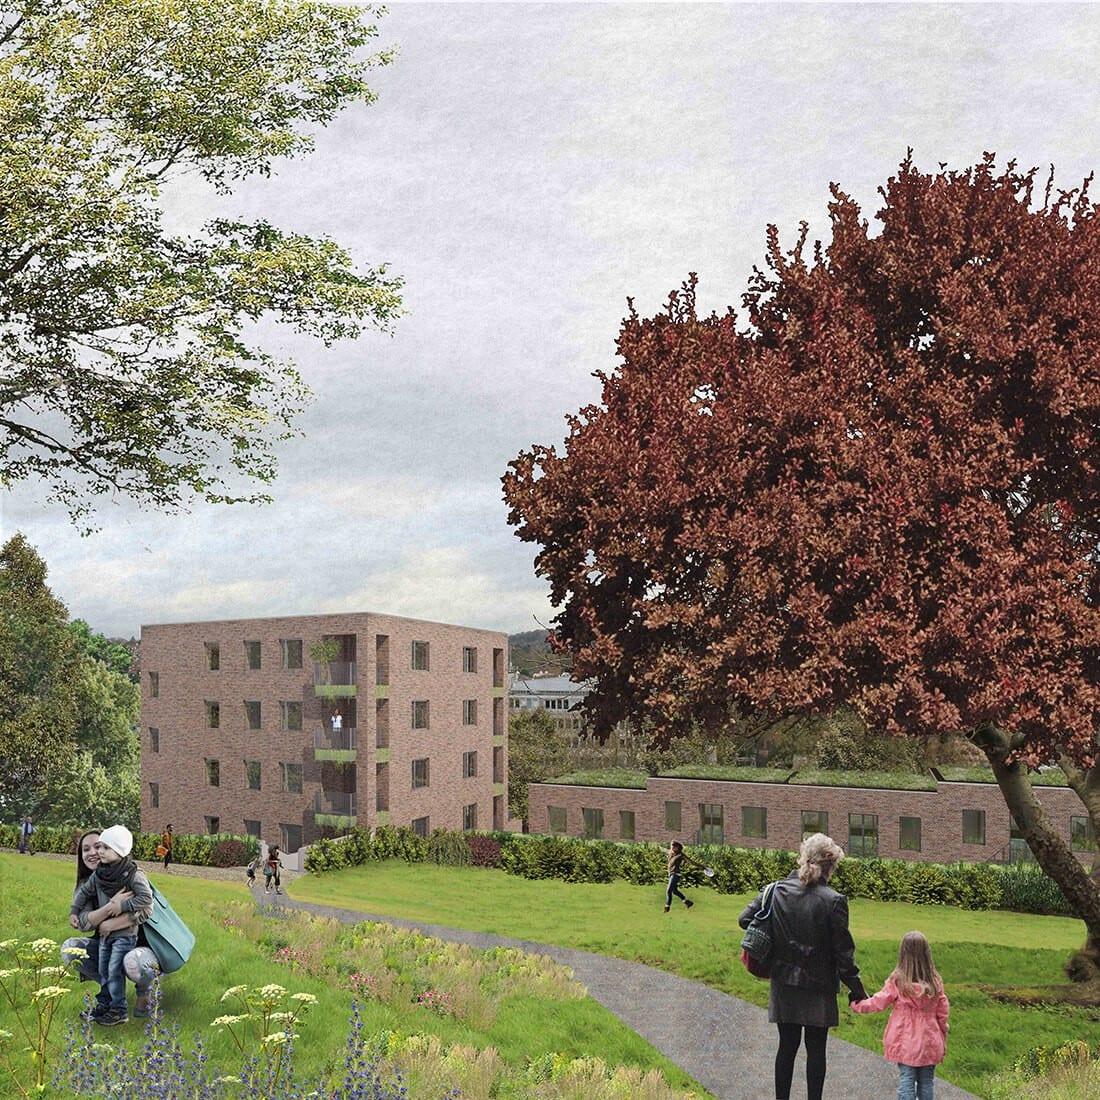 Kingsdown Avenue Montpelier Road Project Image 2